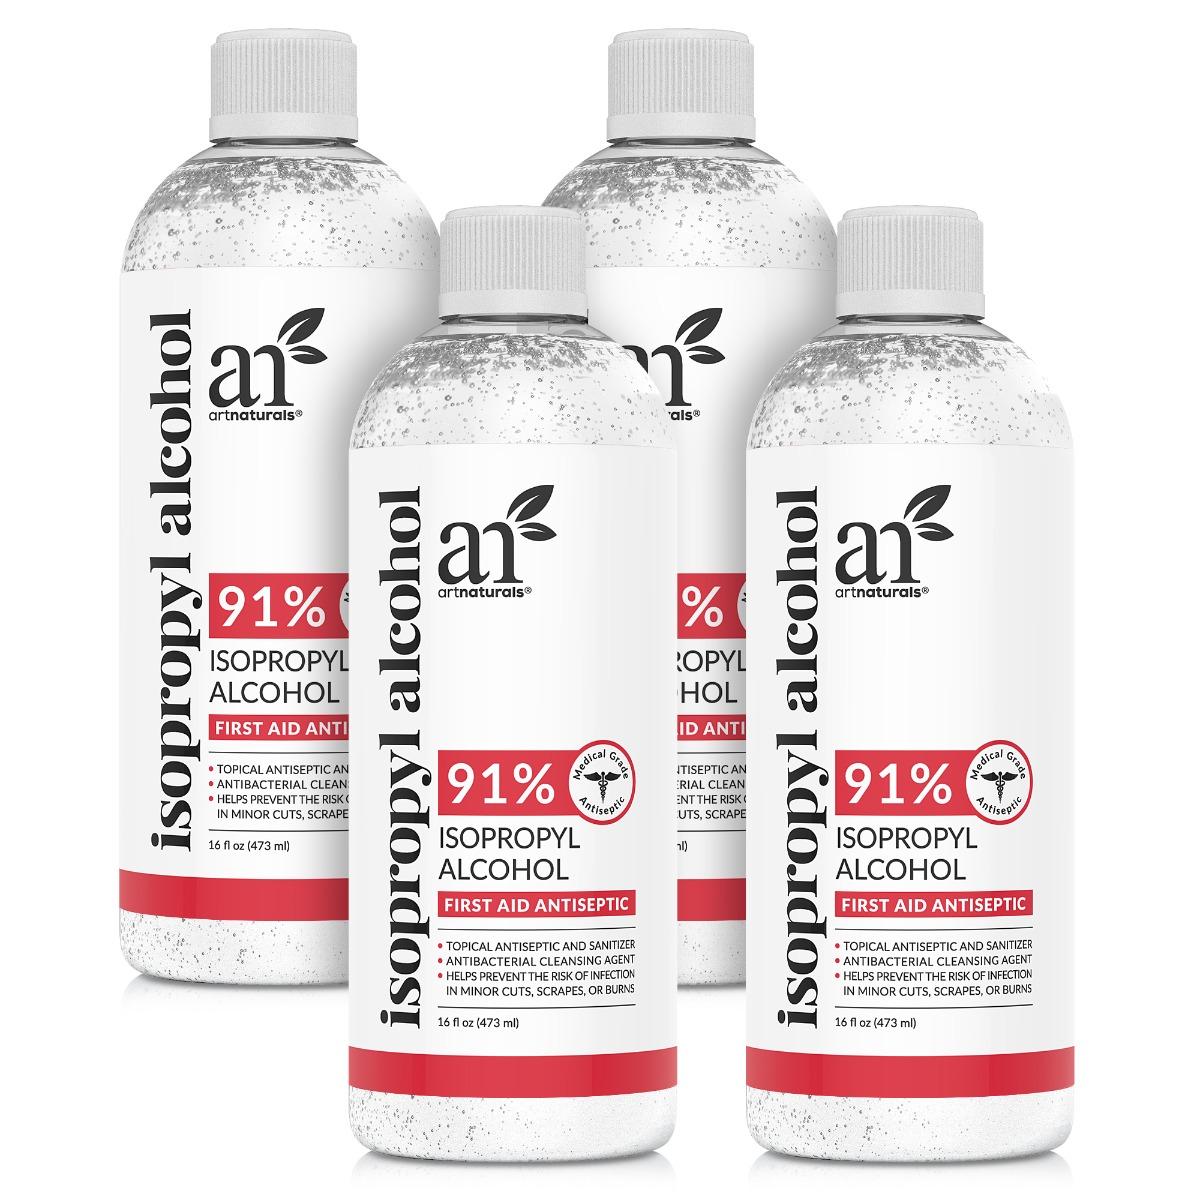 Isopropyl Alcohol 91% Purity - 4 bottles of 16oz